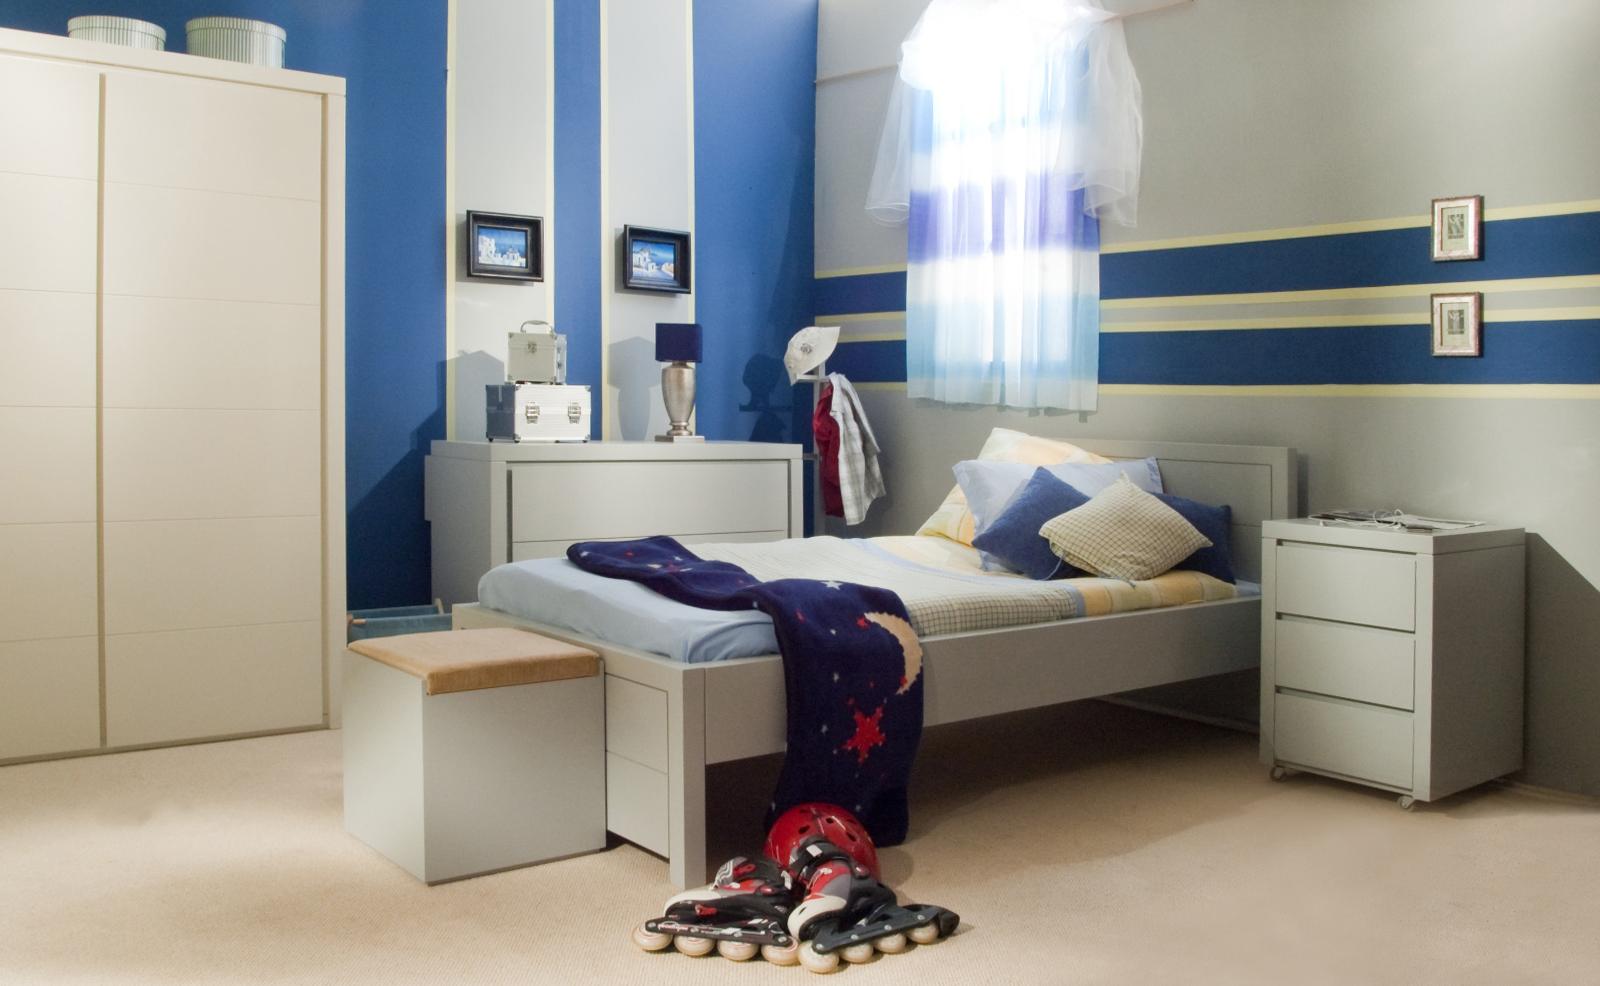 Como ordenar el cuarto de ni os me lo dijo lola - Parete a righe camera da letto ...